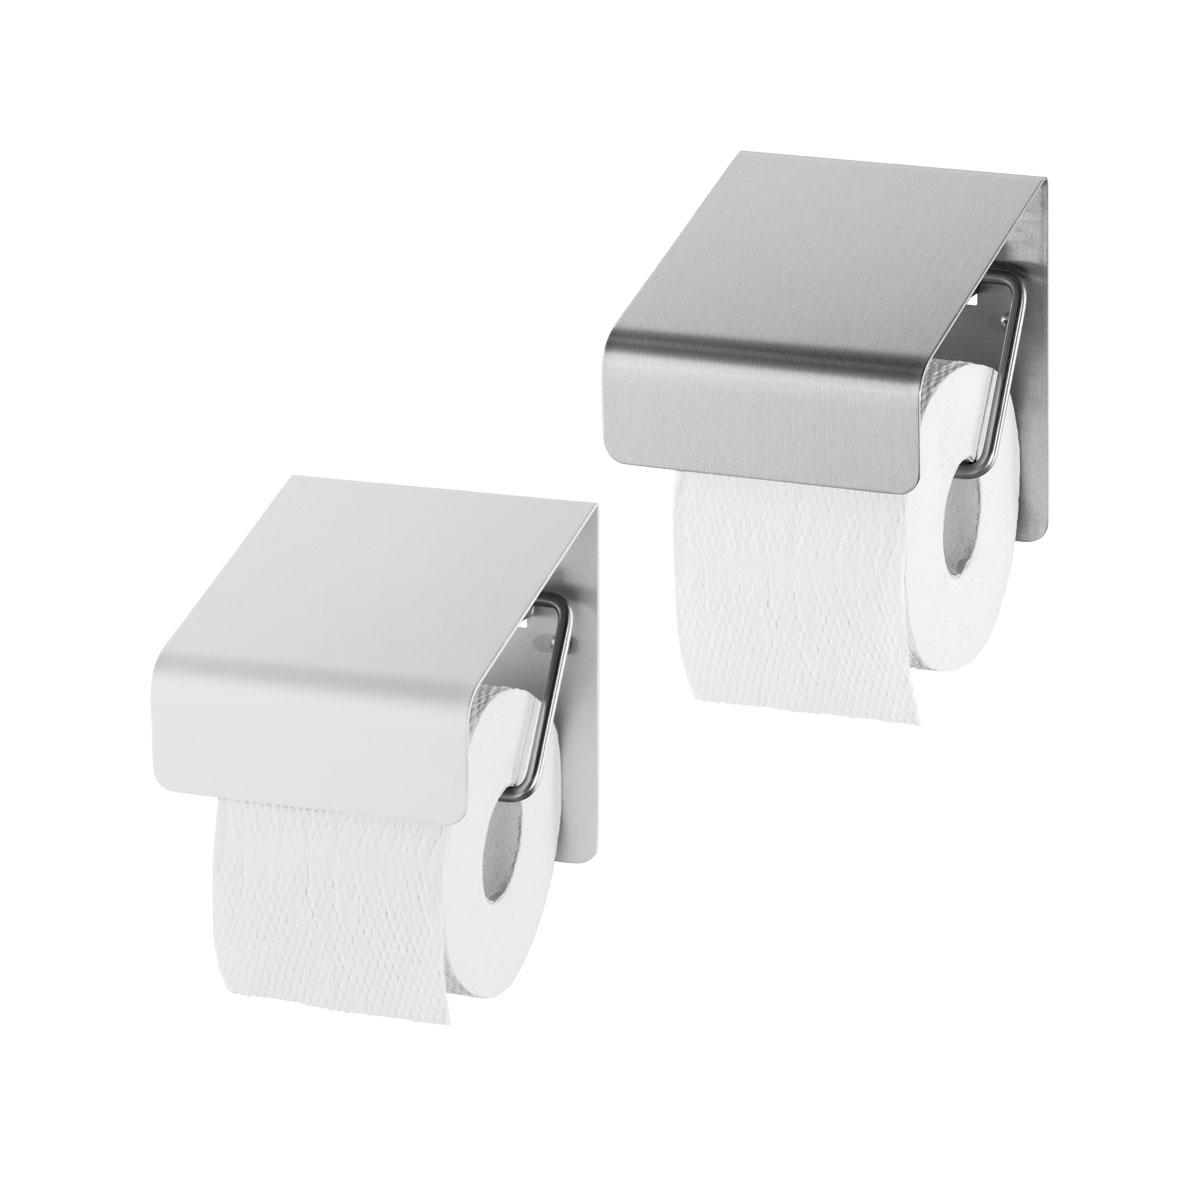 WC-Papierhalter